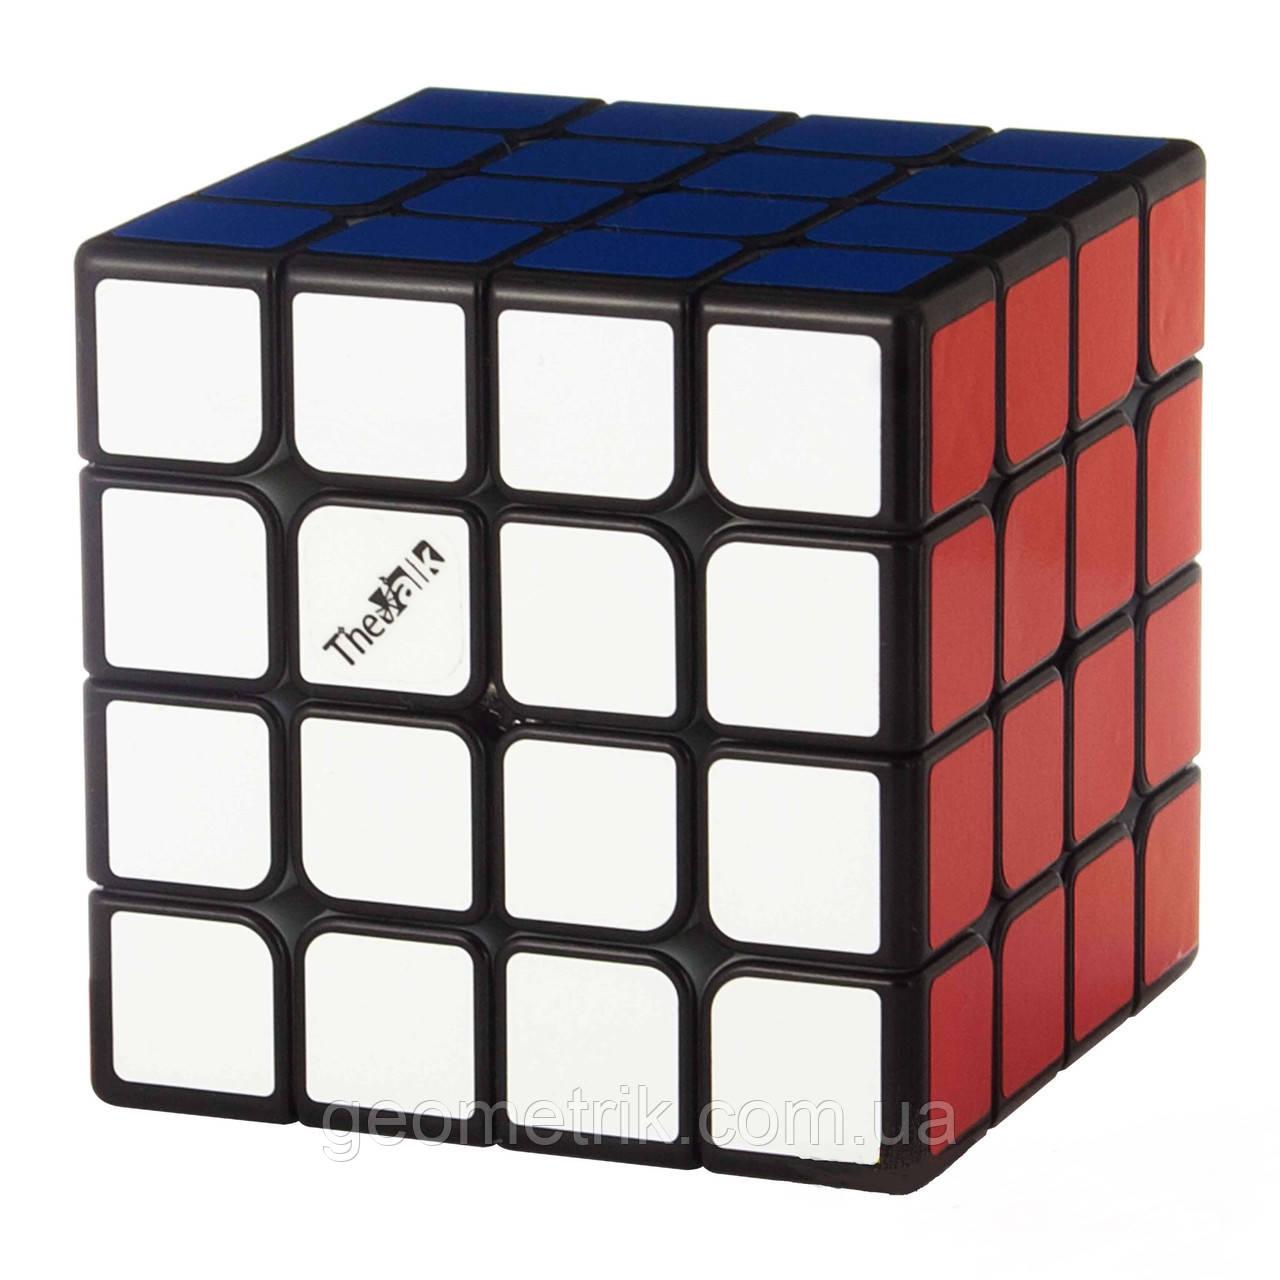 Кубик Рубіка 4х4 Valk 4 M (standard Magnets ) (чорний)